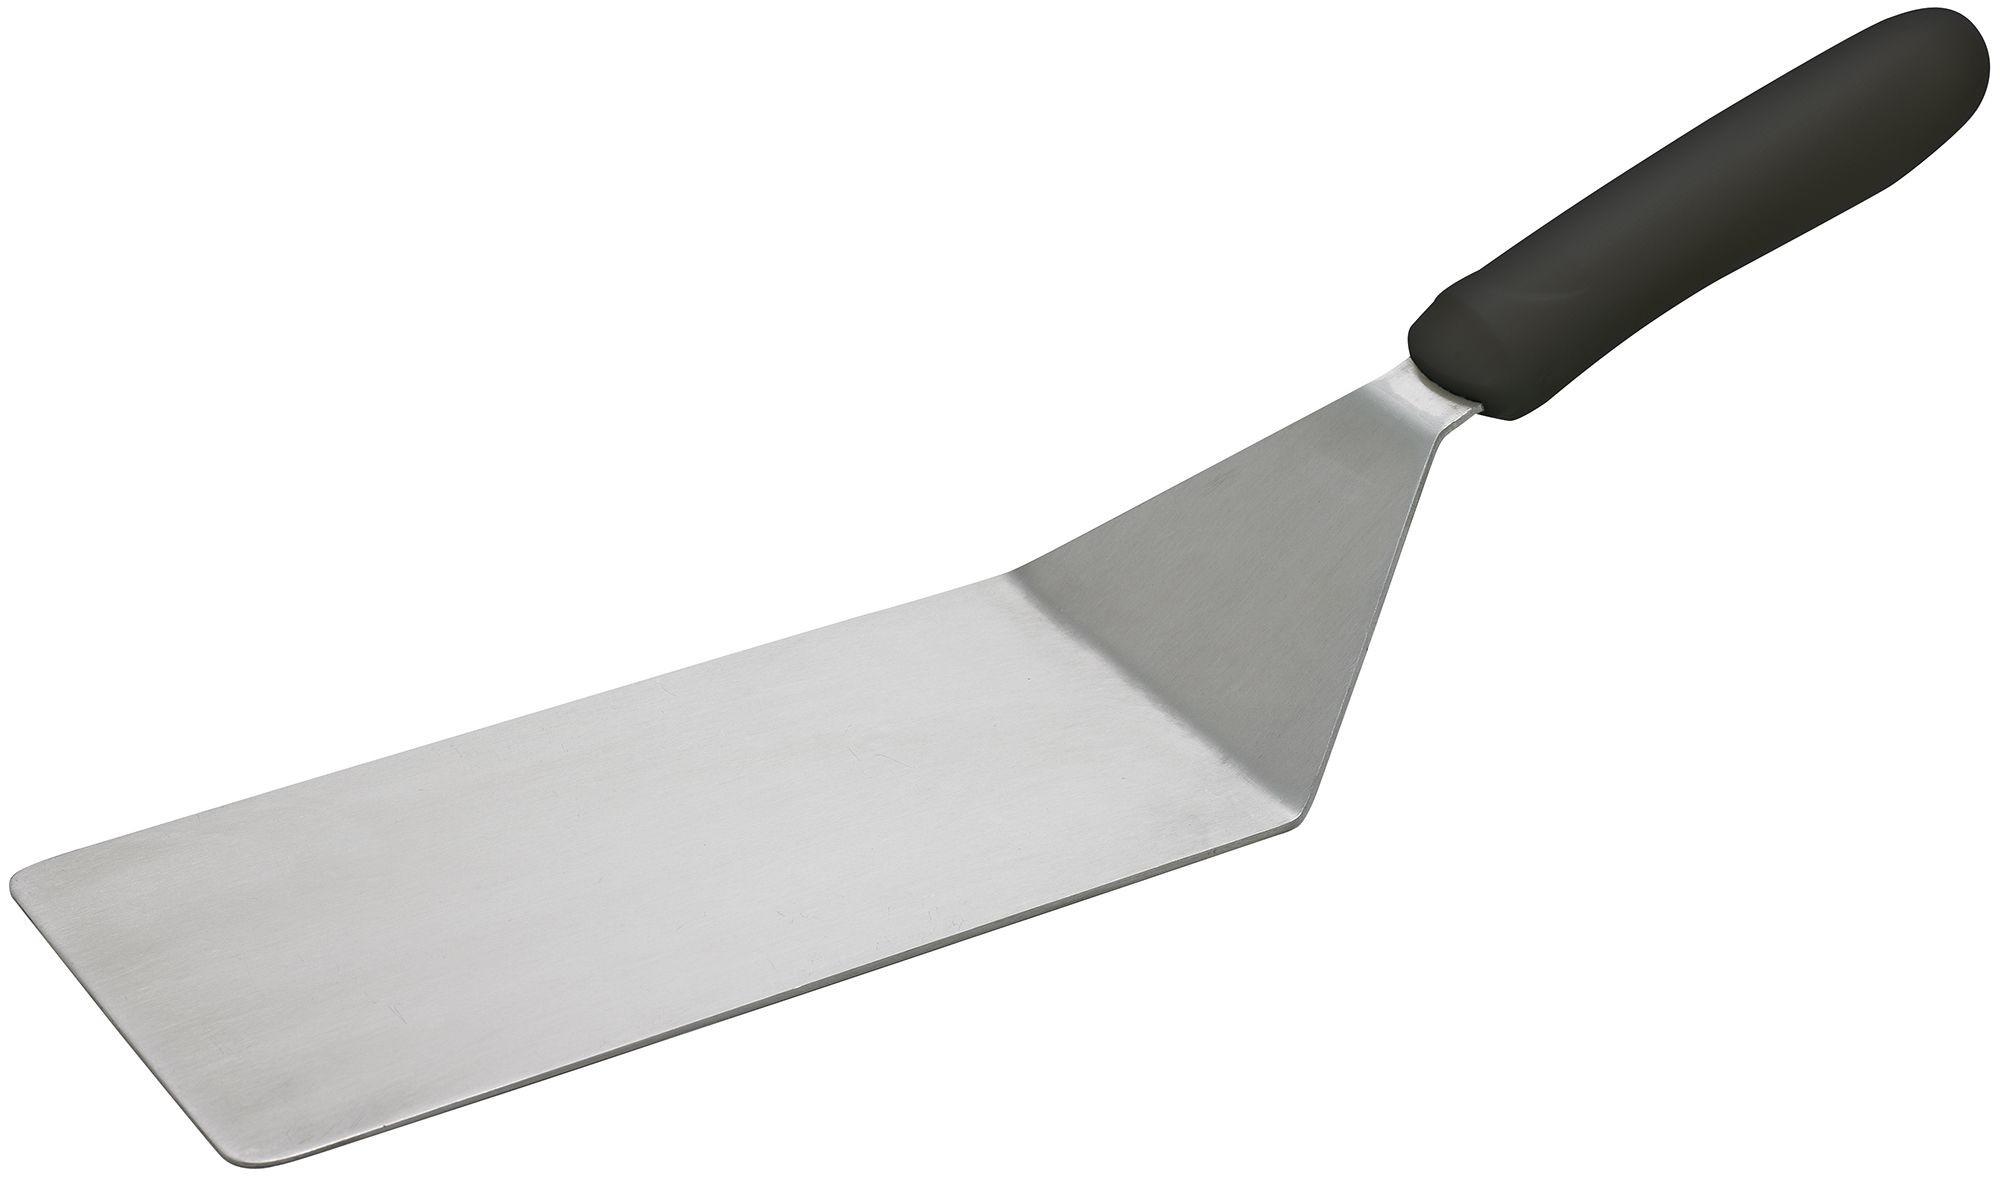 "Winco TKP-42 Offset Solid Stainless Steel Turner, 4"" x 8"" Blade, Black Polypropylene Handle"